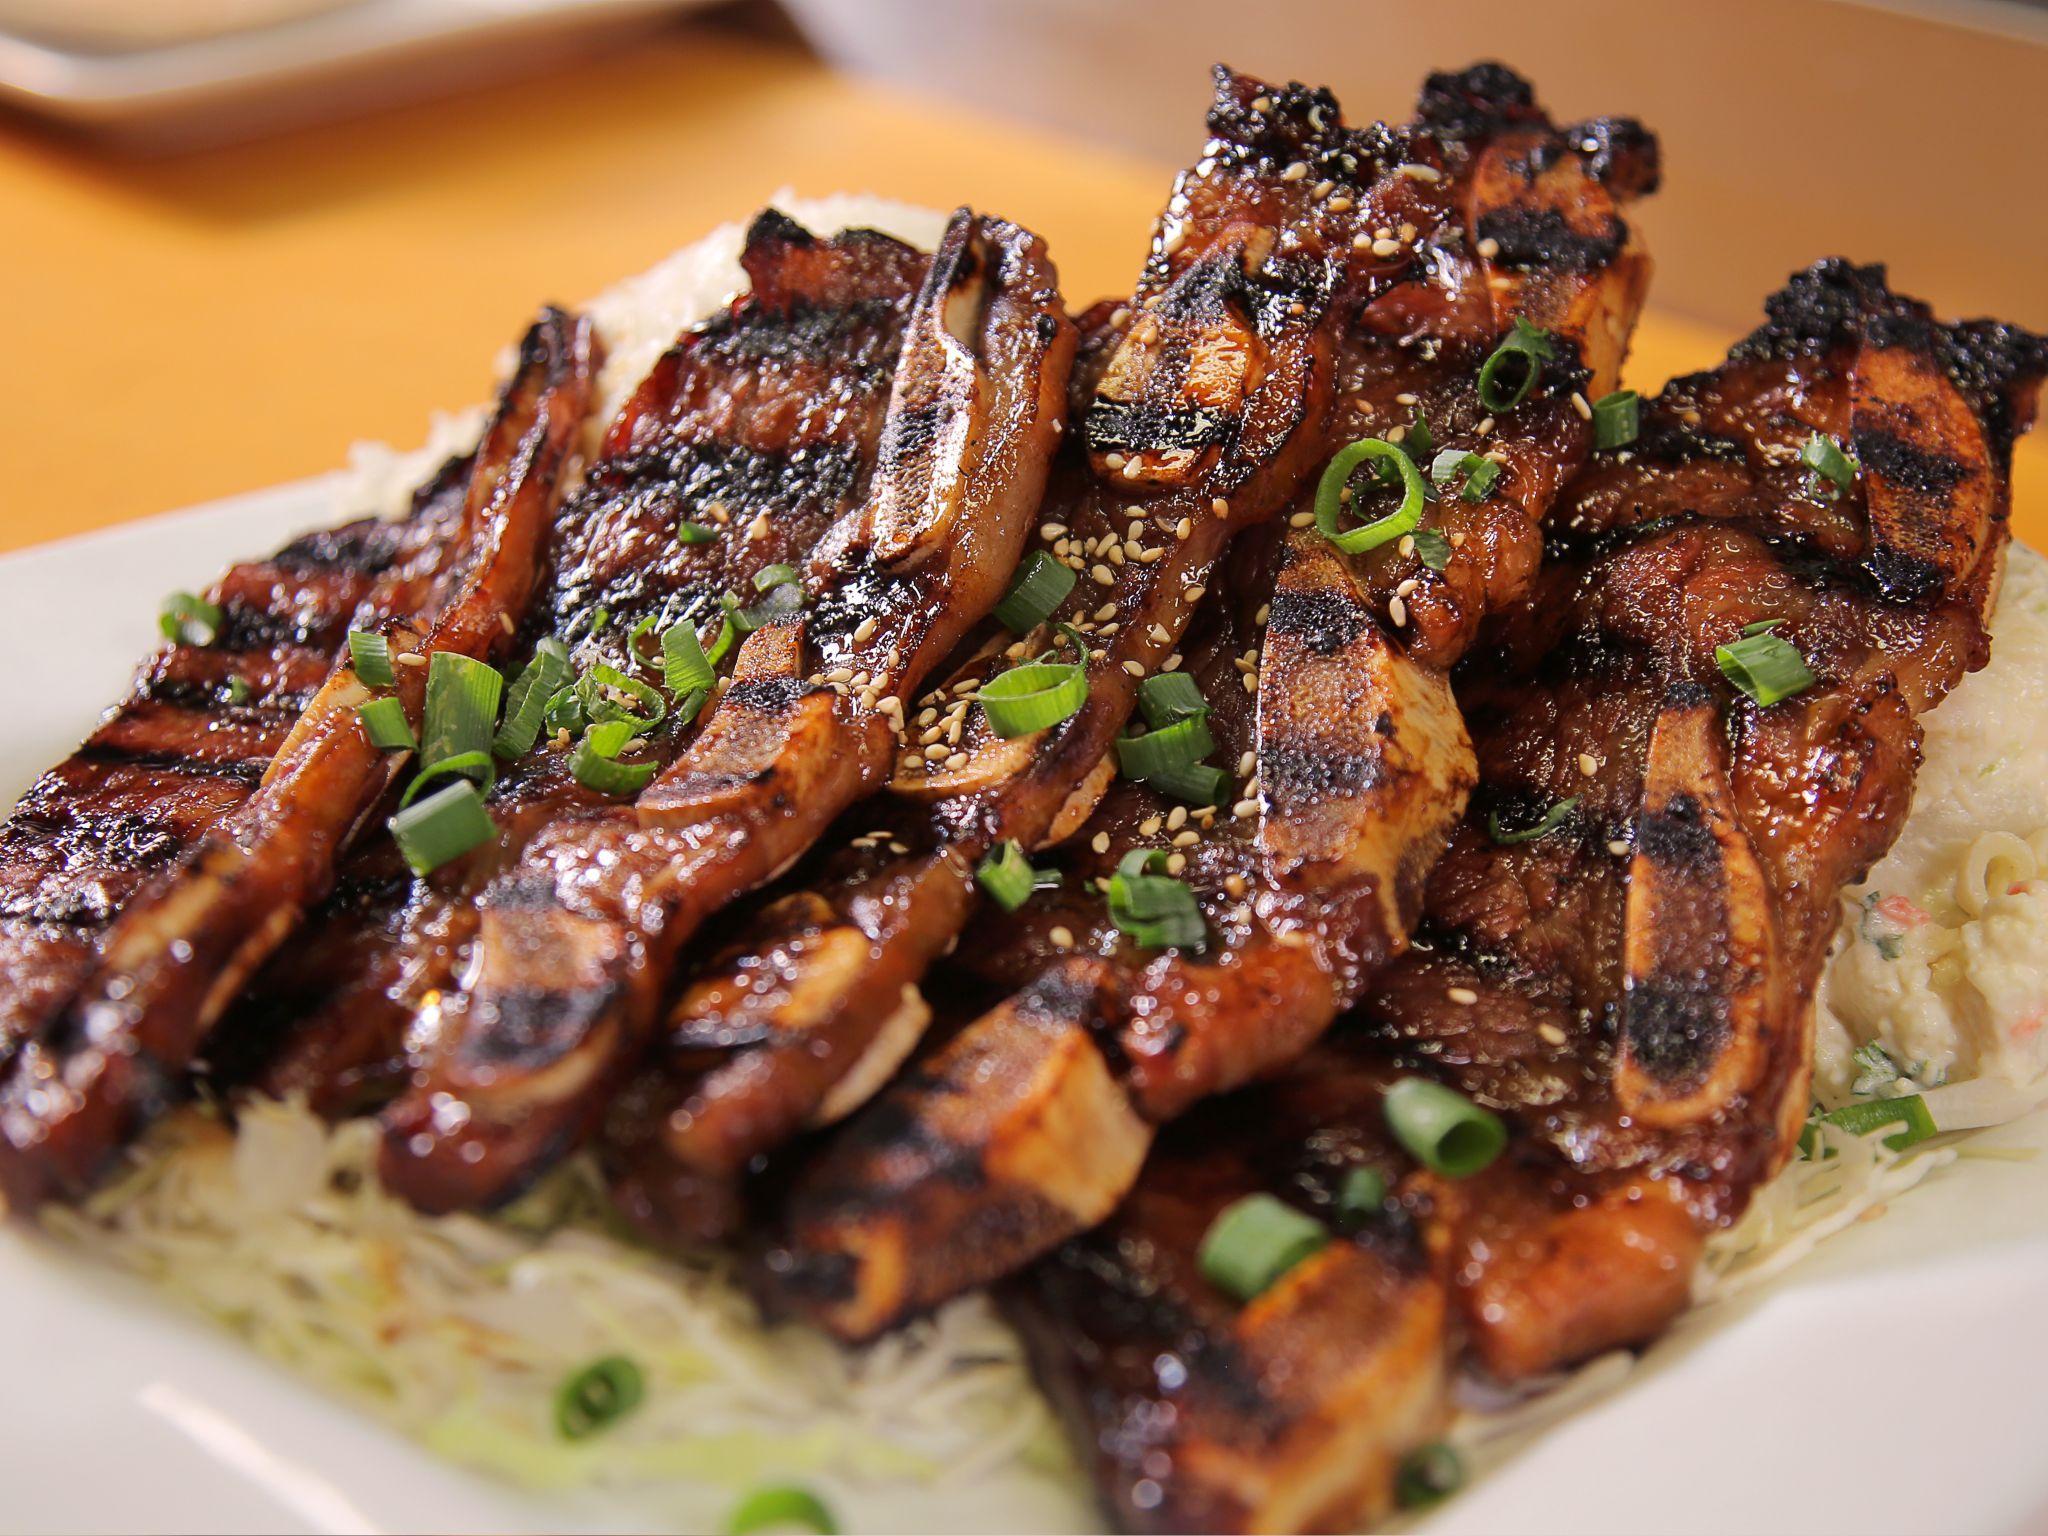 Kalbi short ribs in da kitchen teriyaki sauce recipe teriyaki food network forumfinder Images